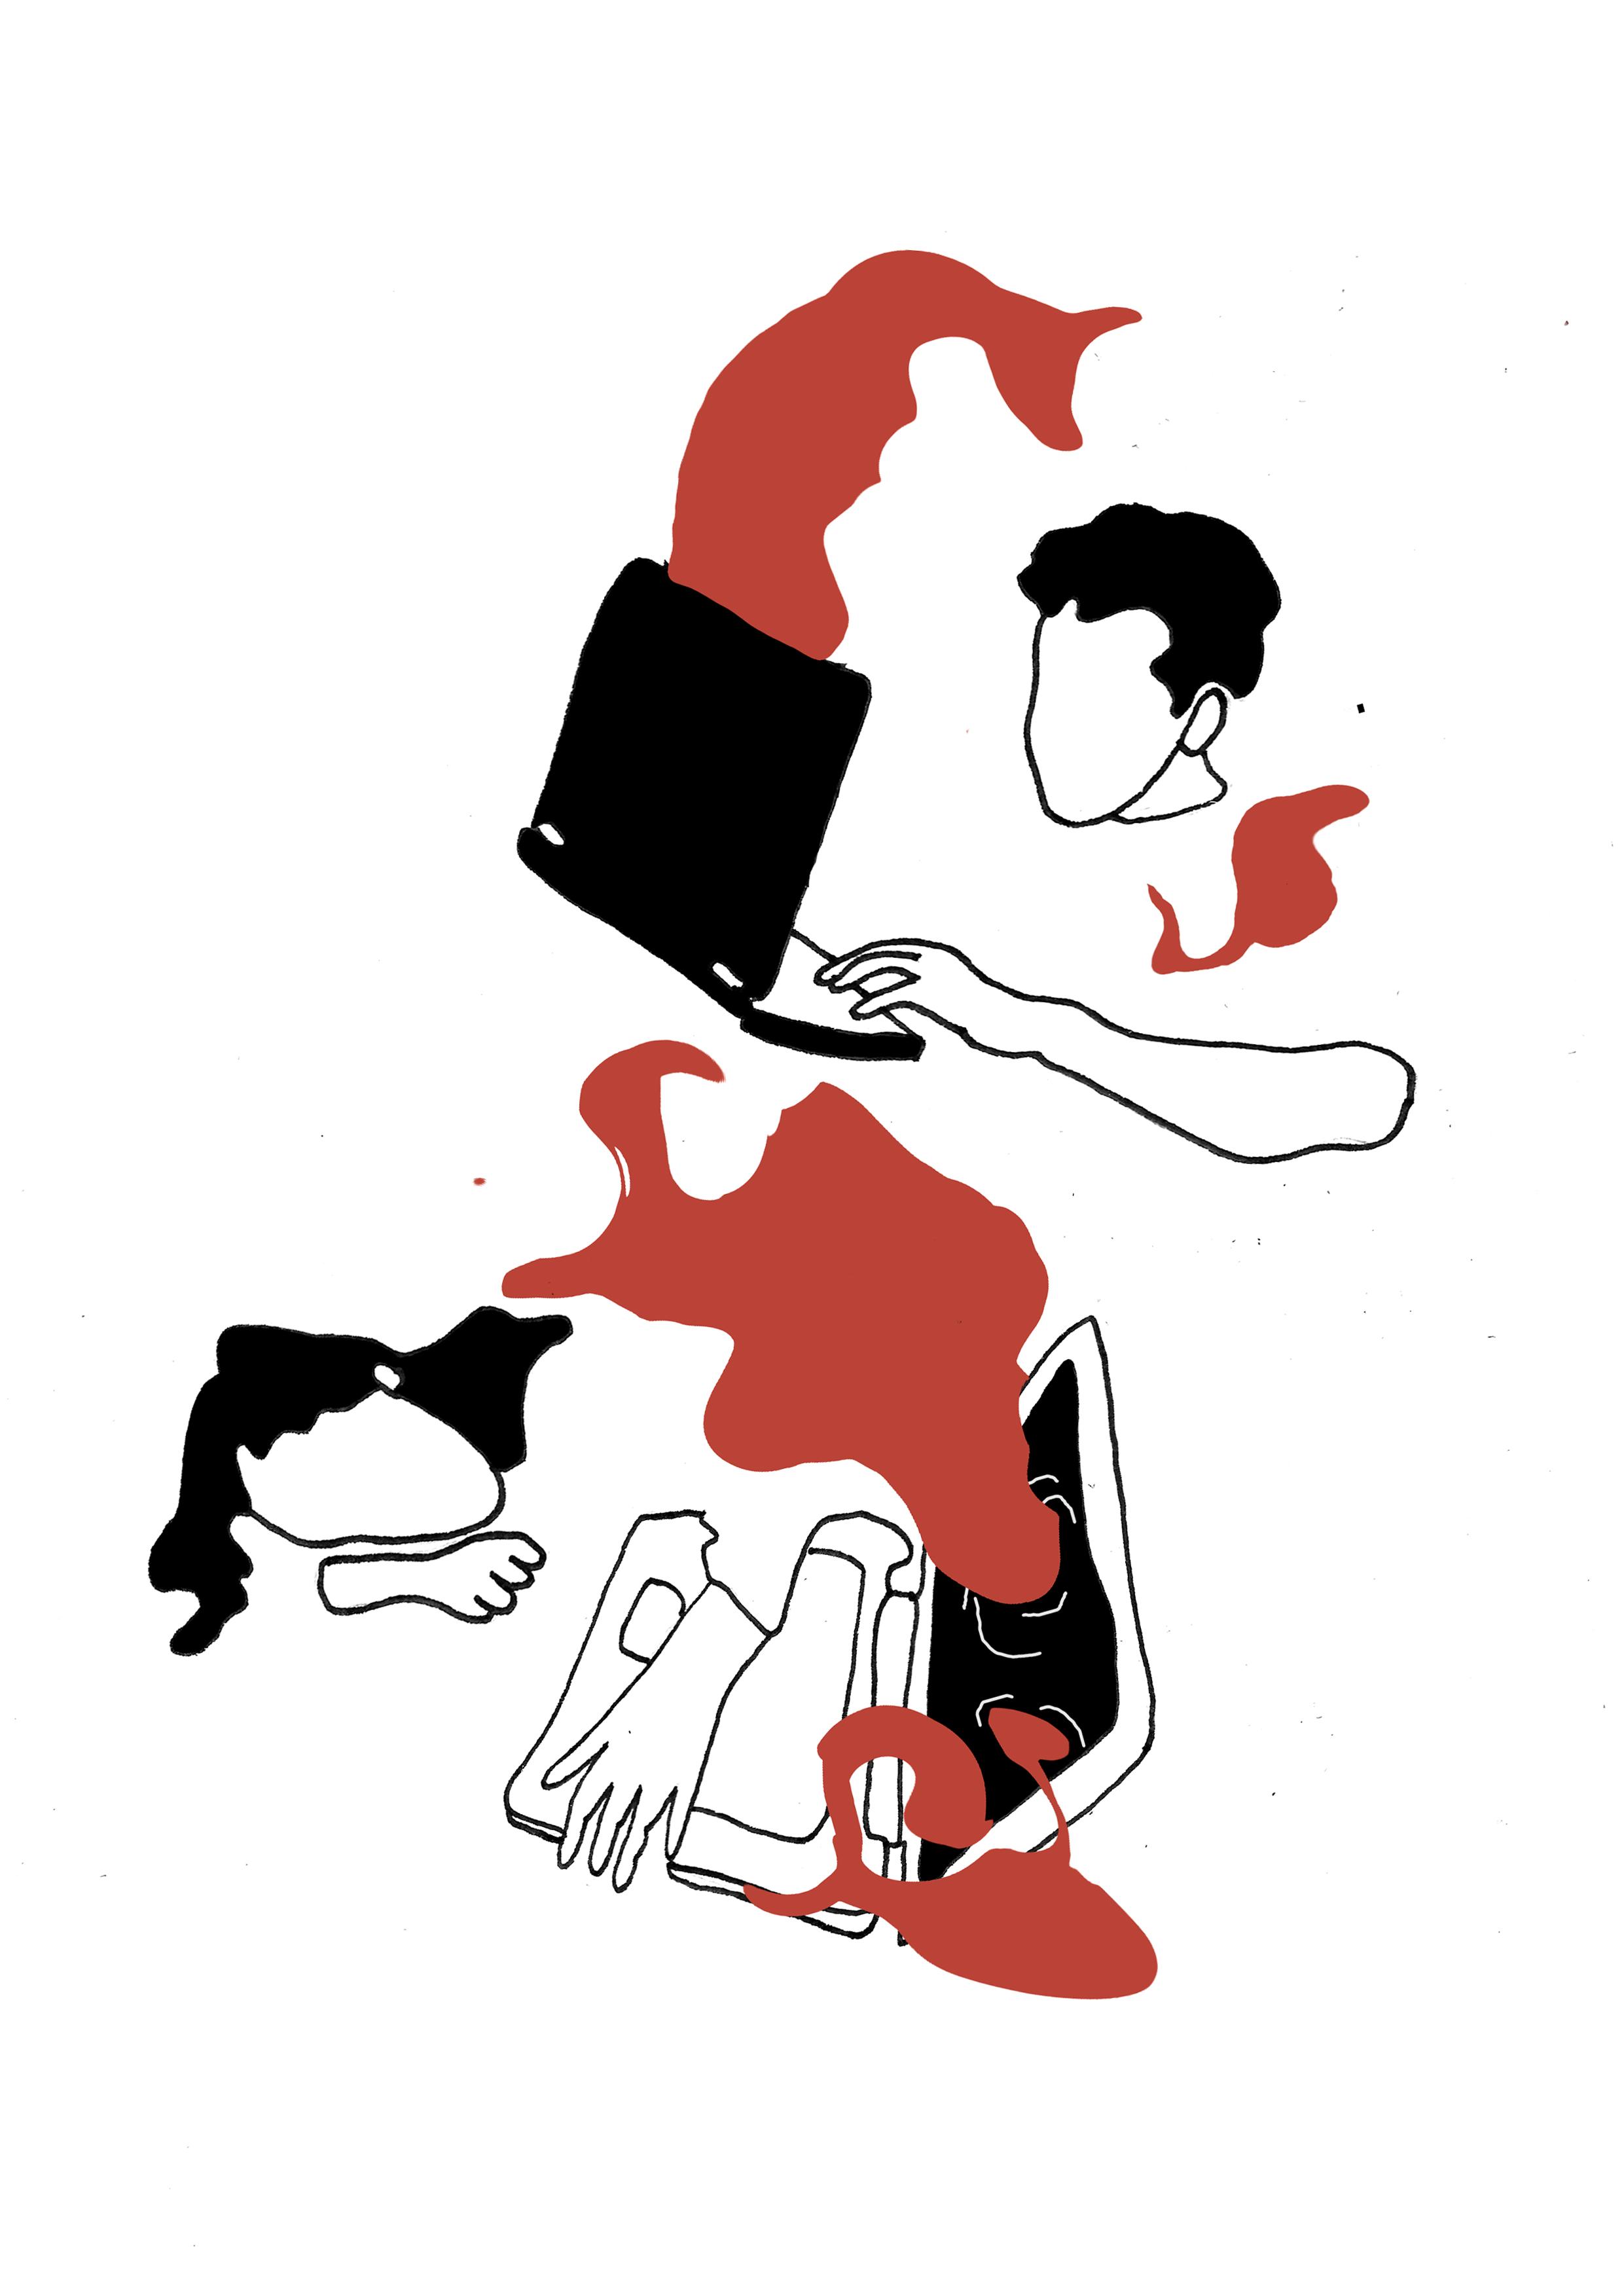 illustartion: Sasha Derkach